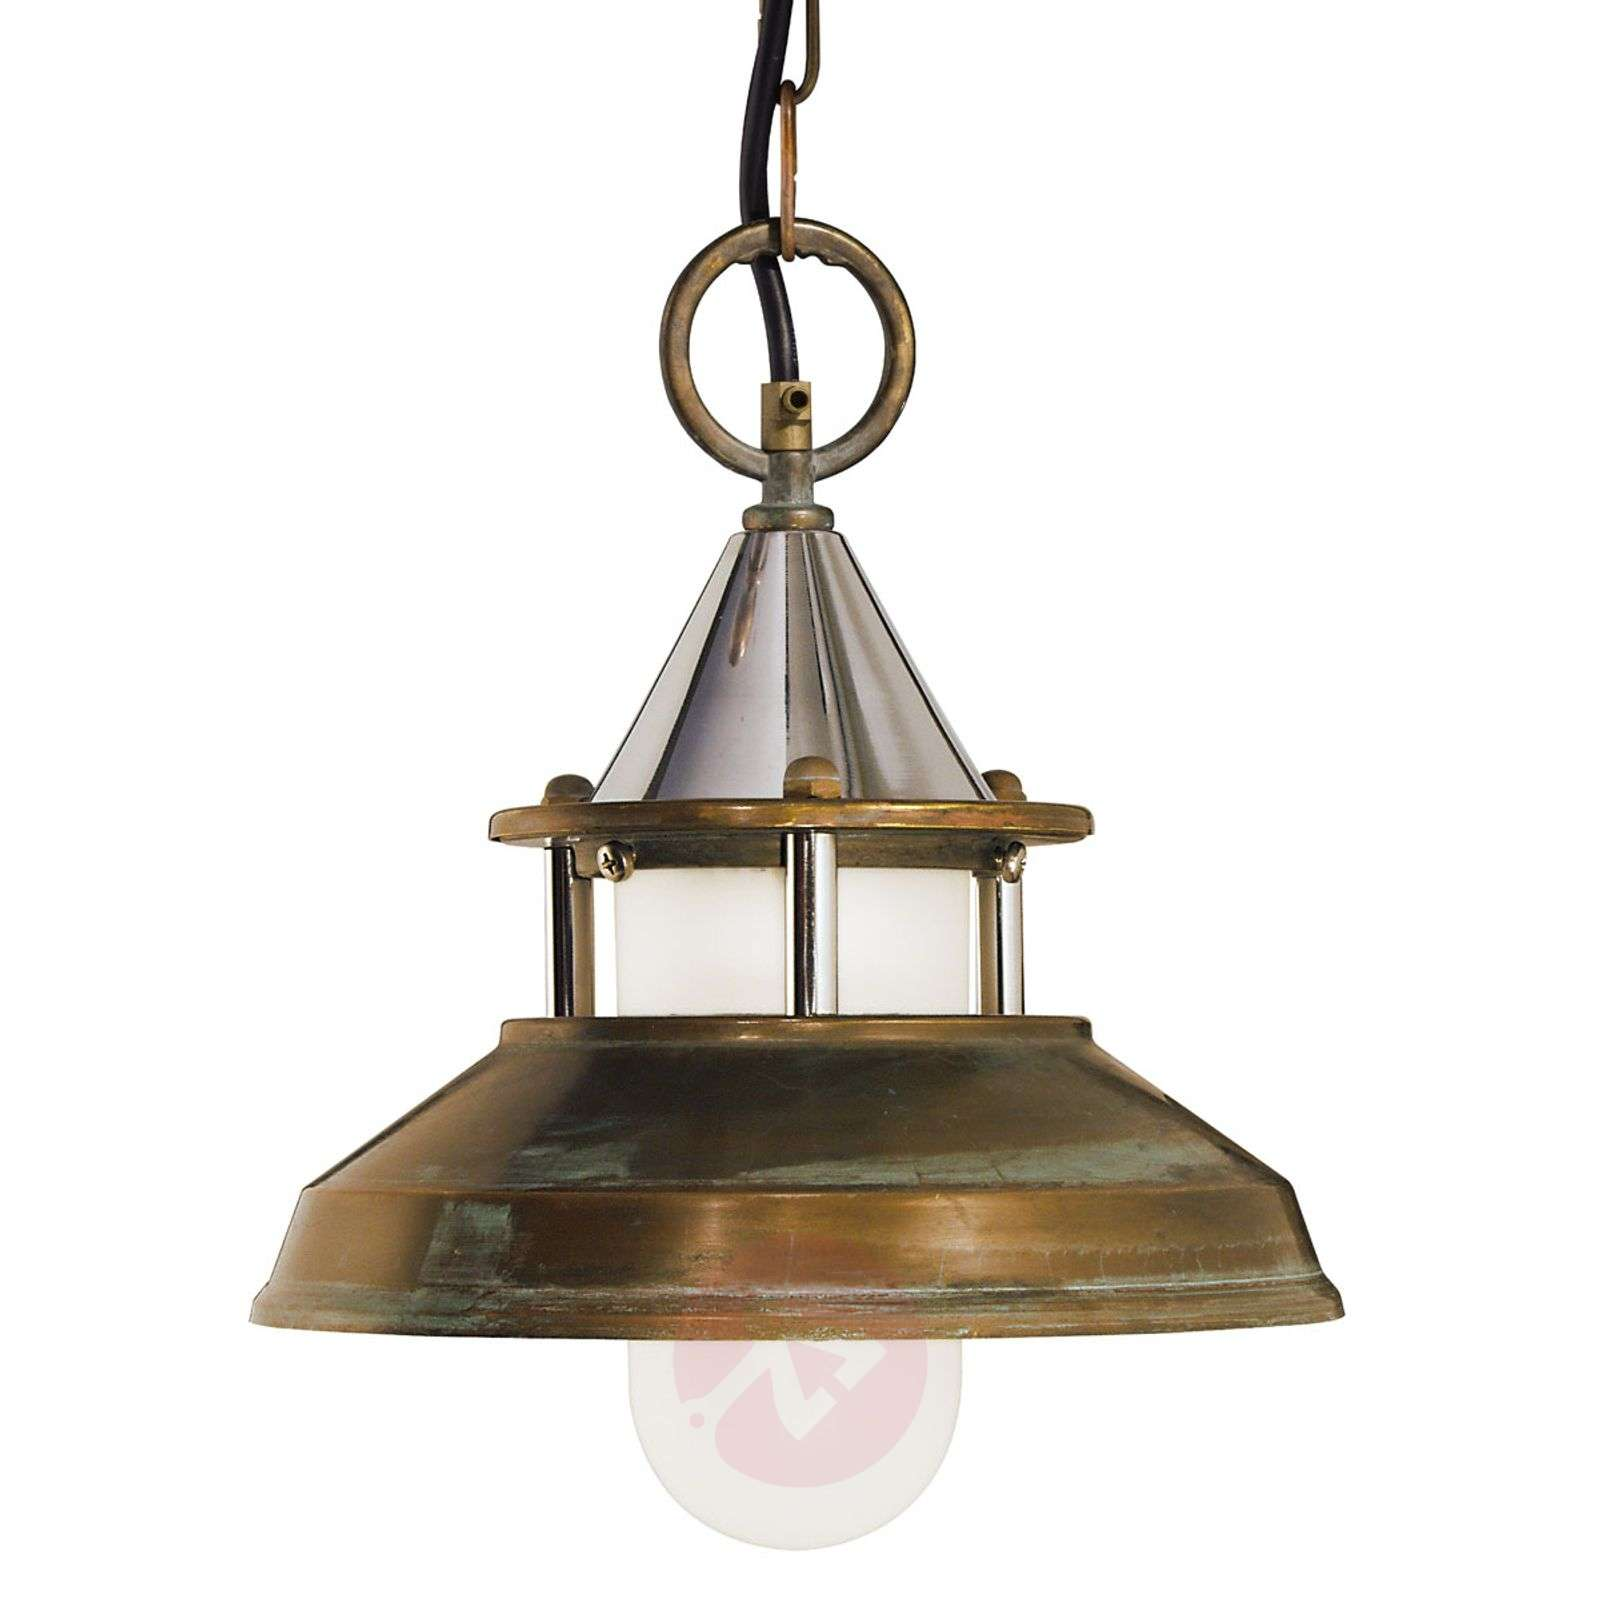 Decorative outdoor hanging light Lampara-6515095-01